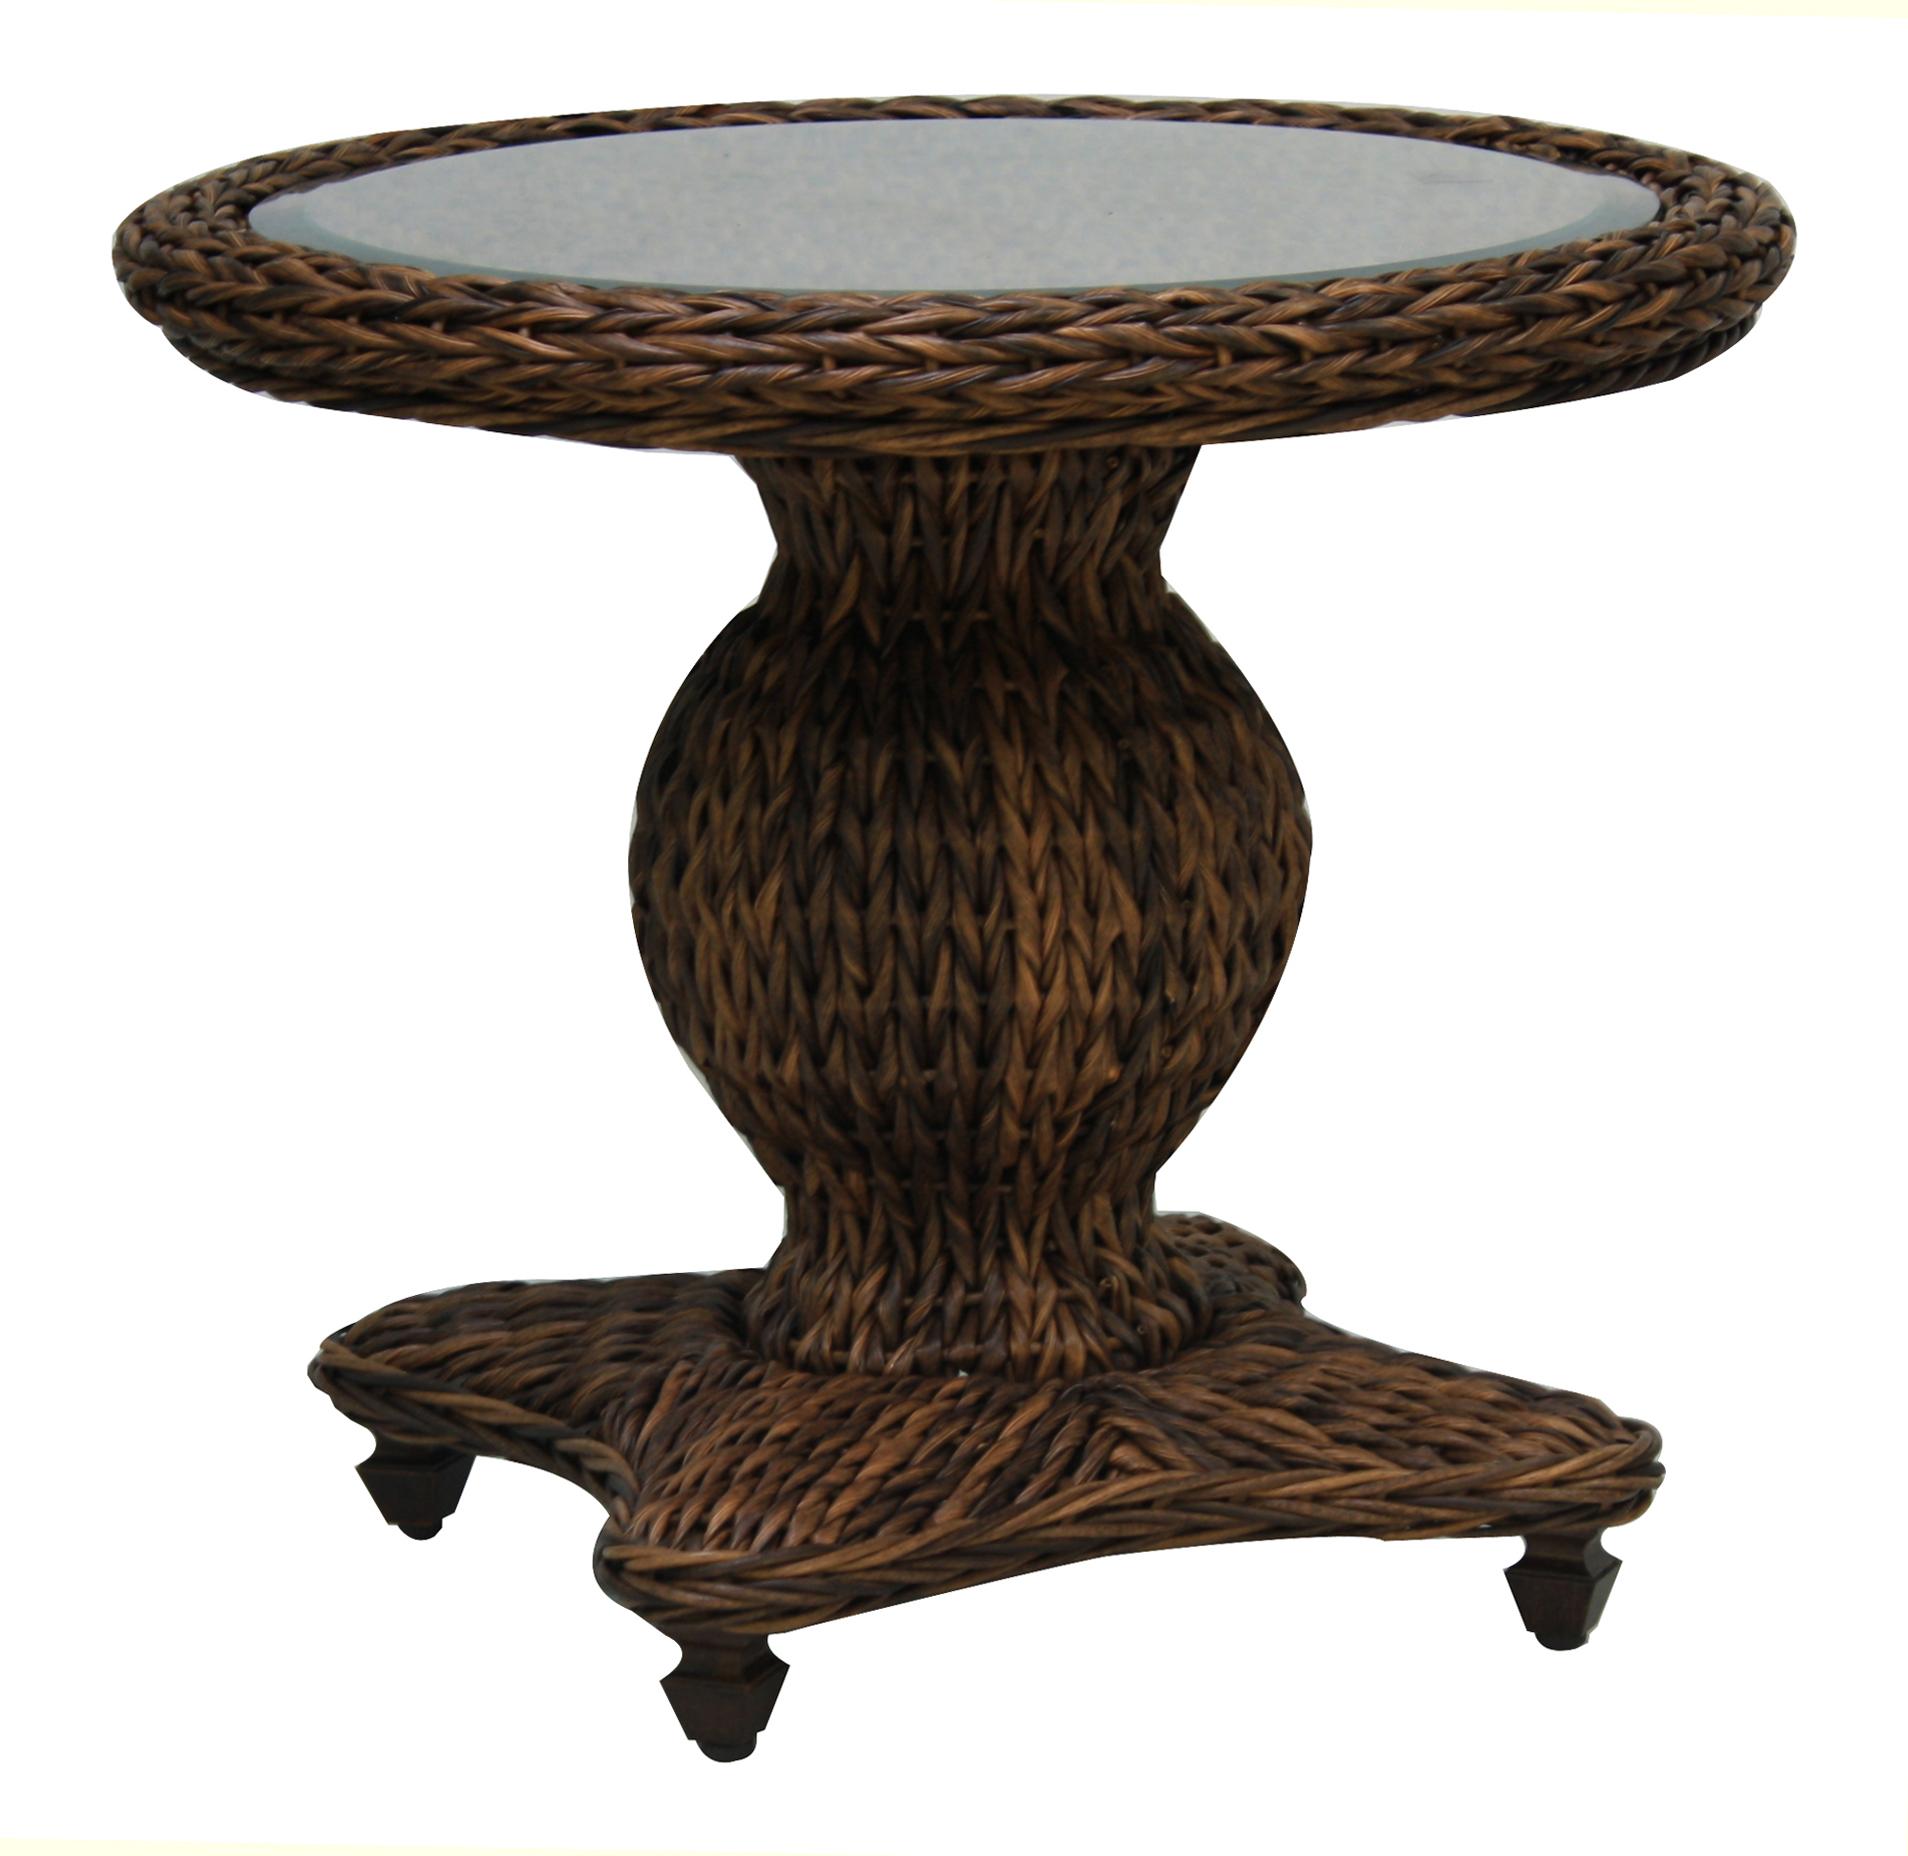 "973822 Antigua End Table  *see Book  (973822TW Antigua Woven Top & Glass) (973822B Antigua End Table Base)  26.1"" x 26.1"" x 21.9"""